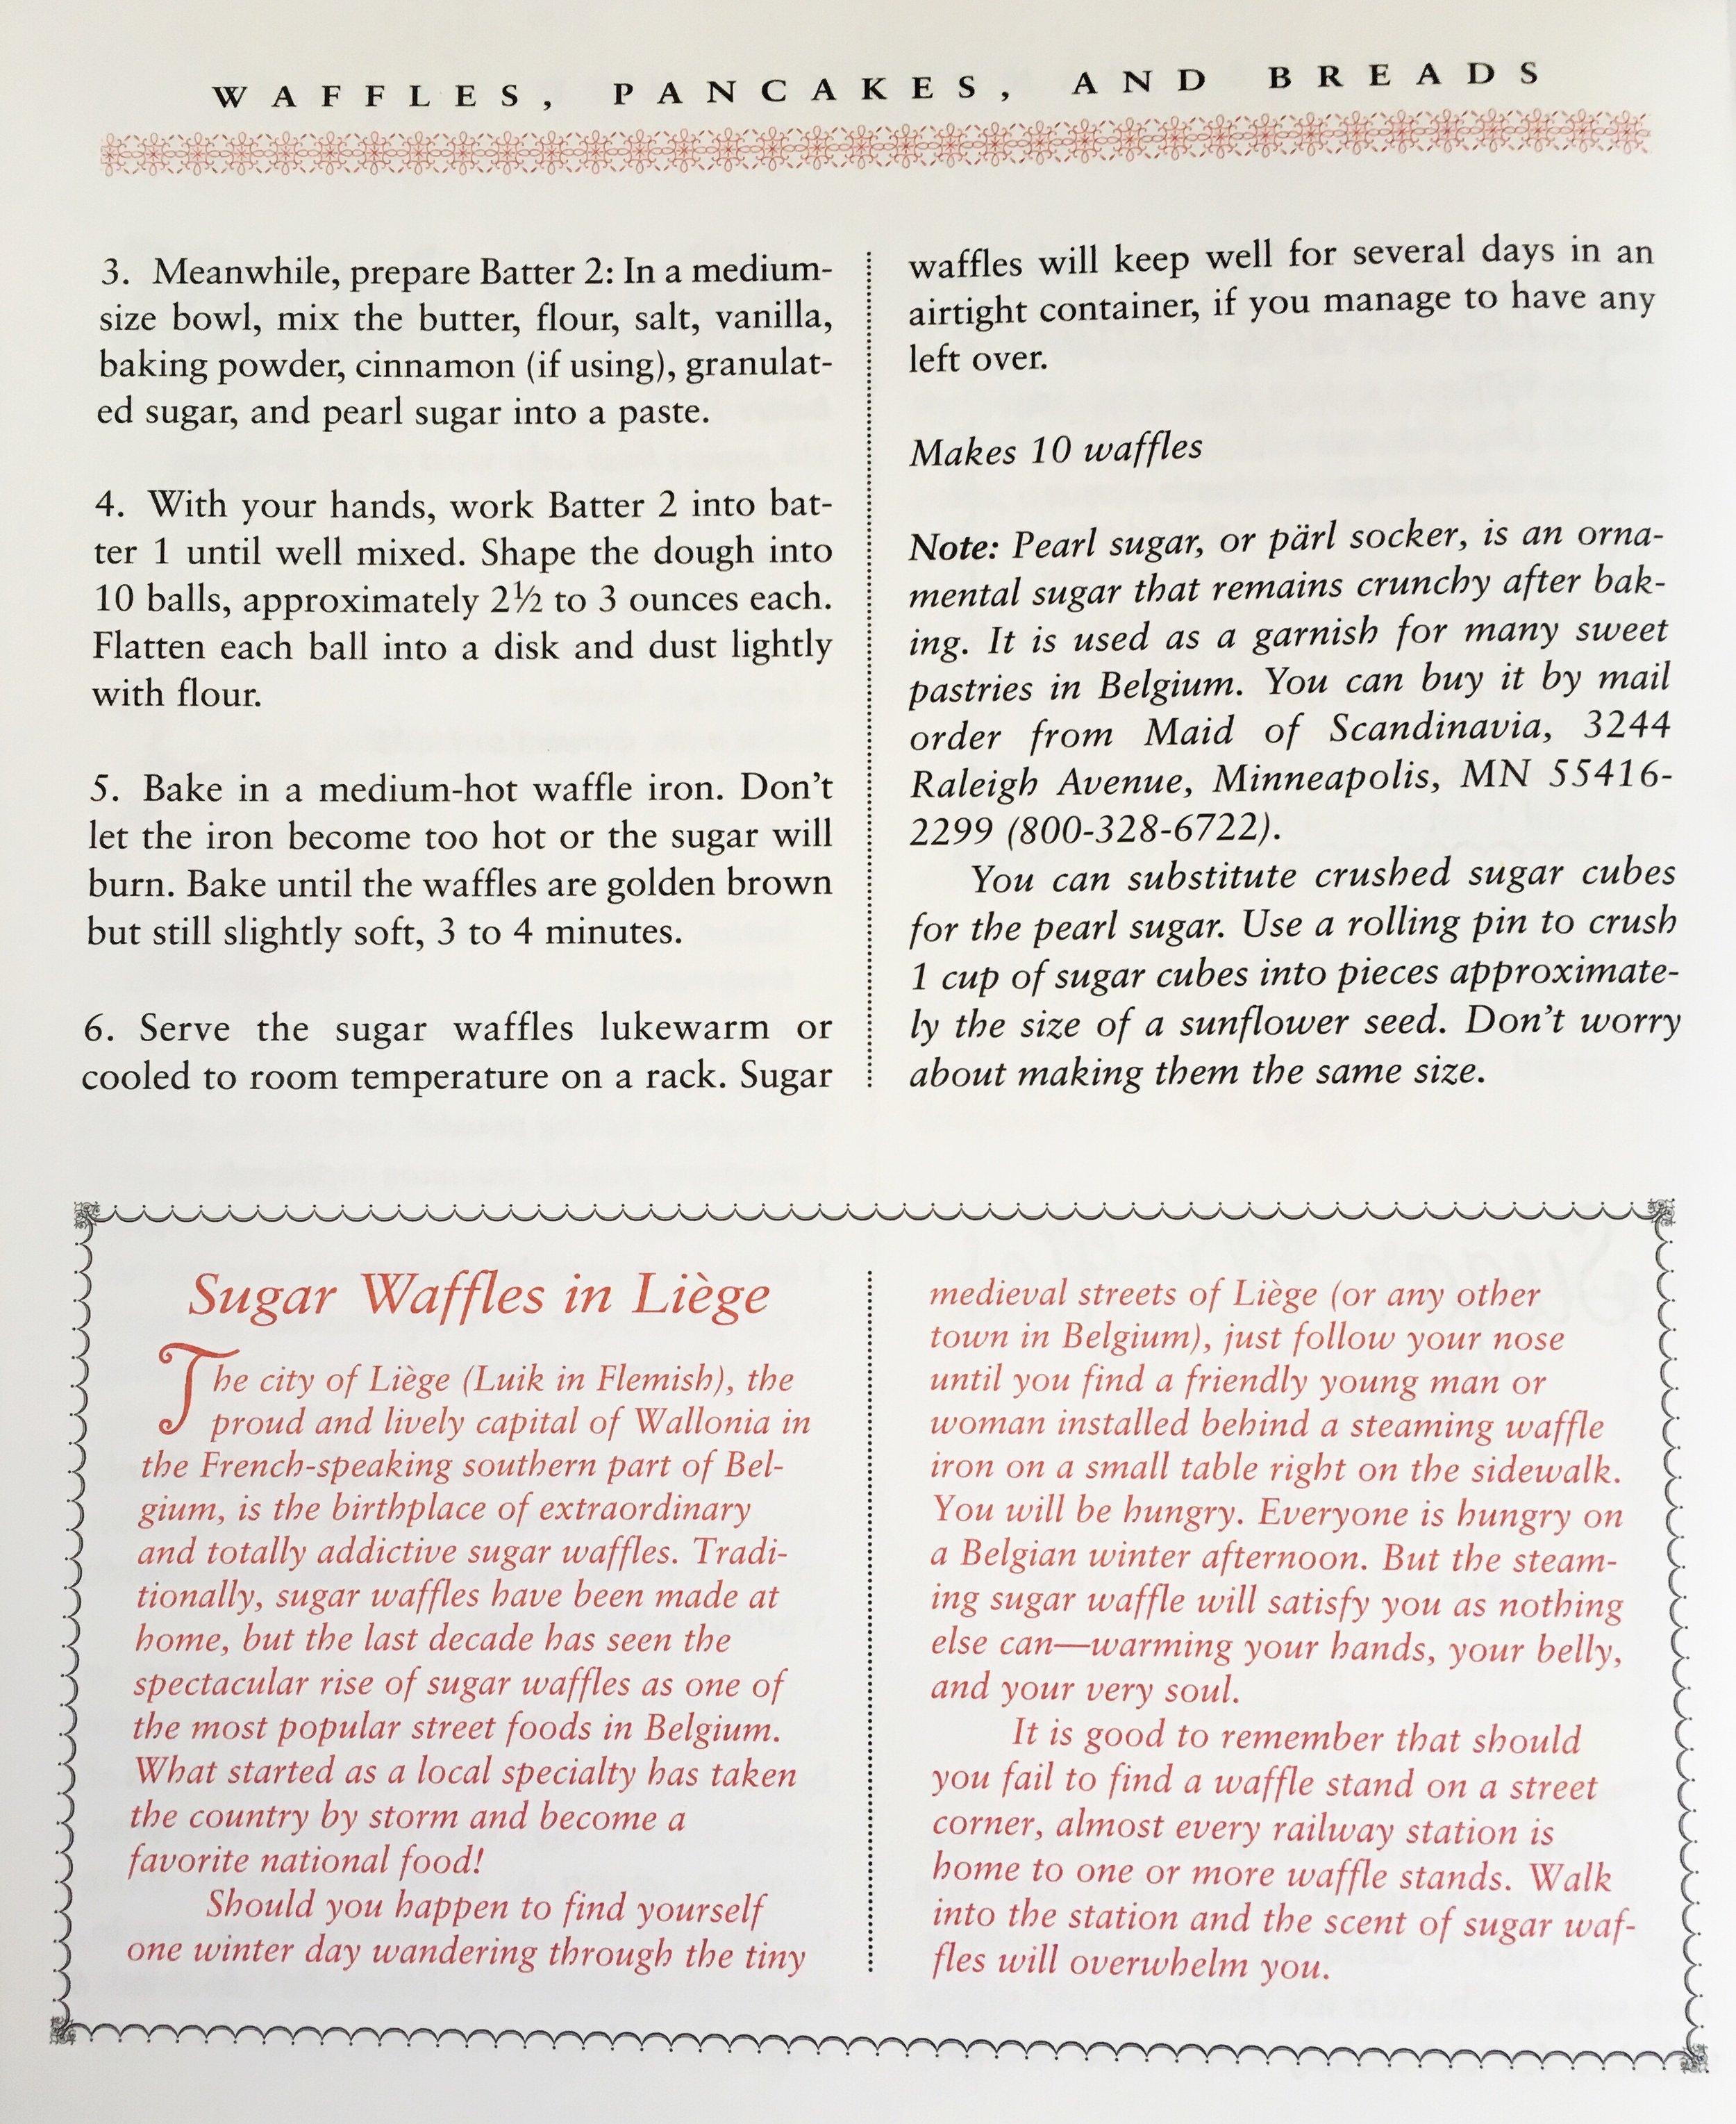 waffles recipe page 2.JPG